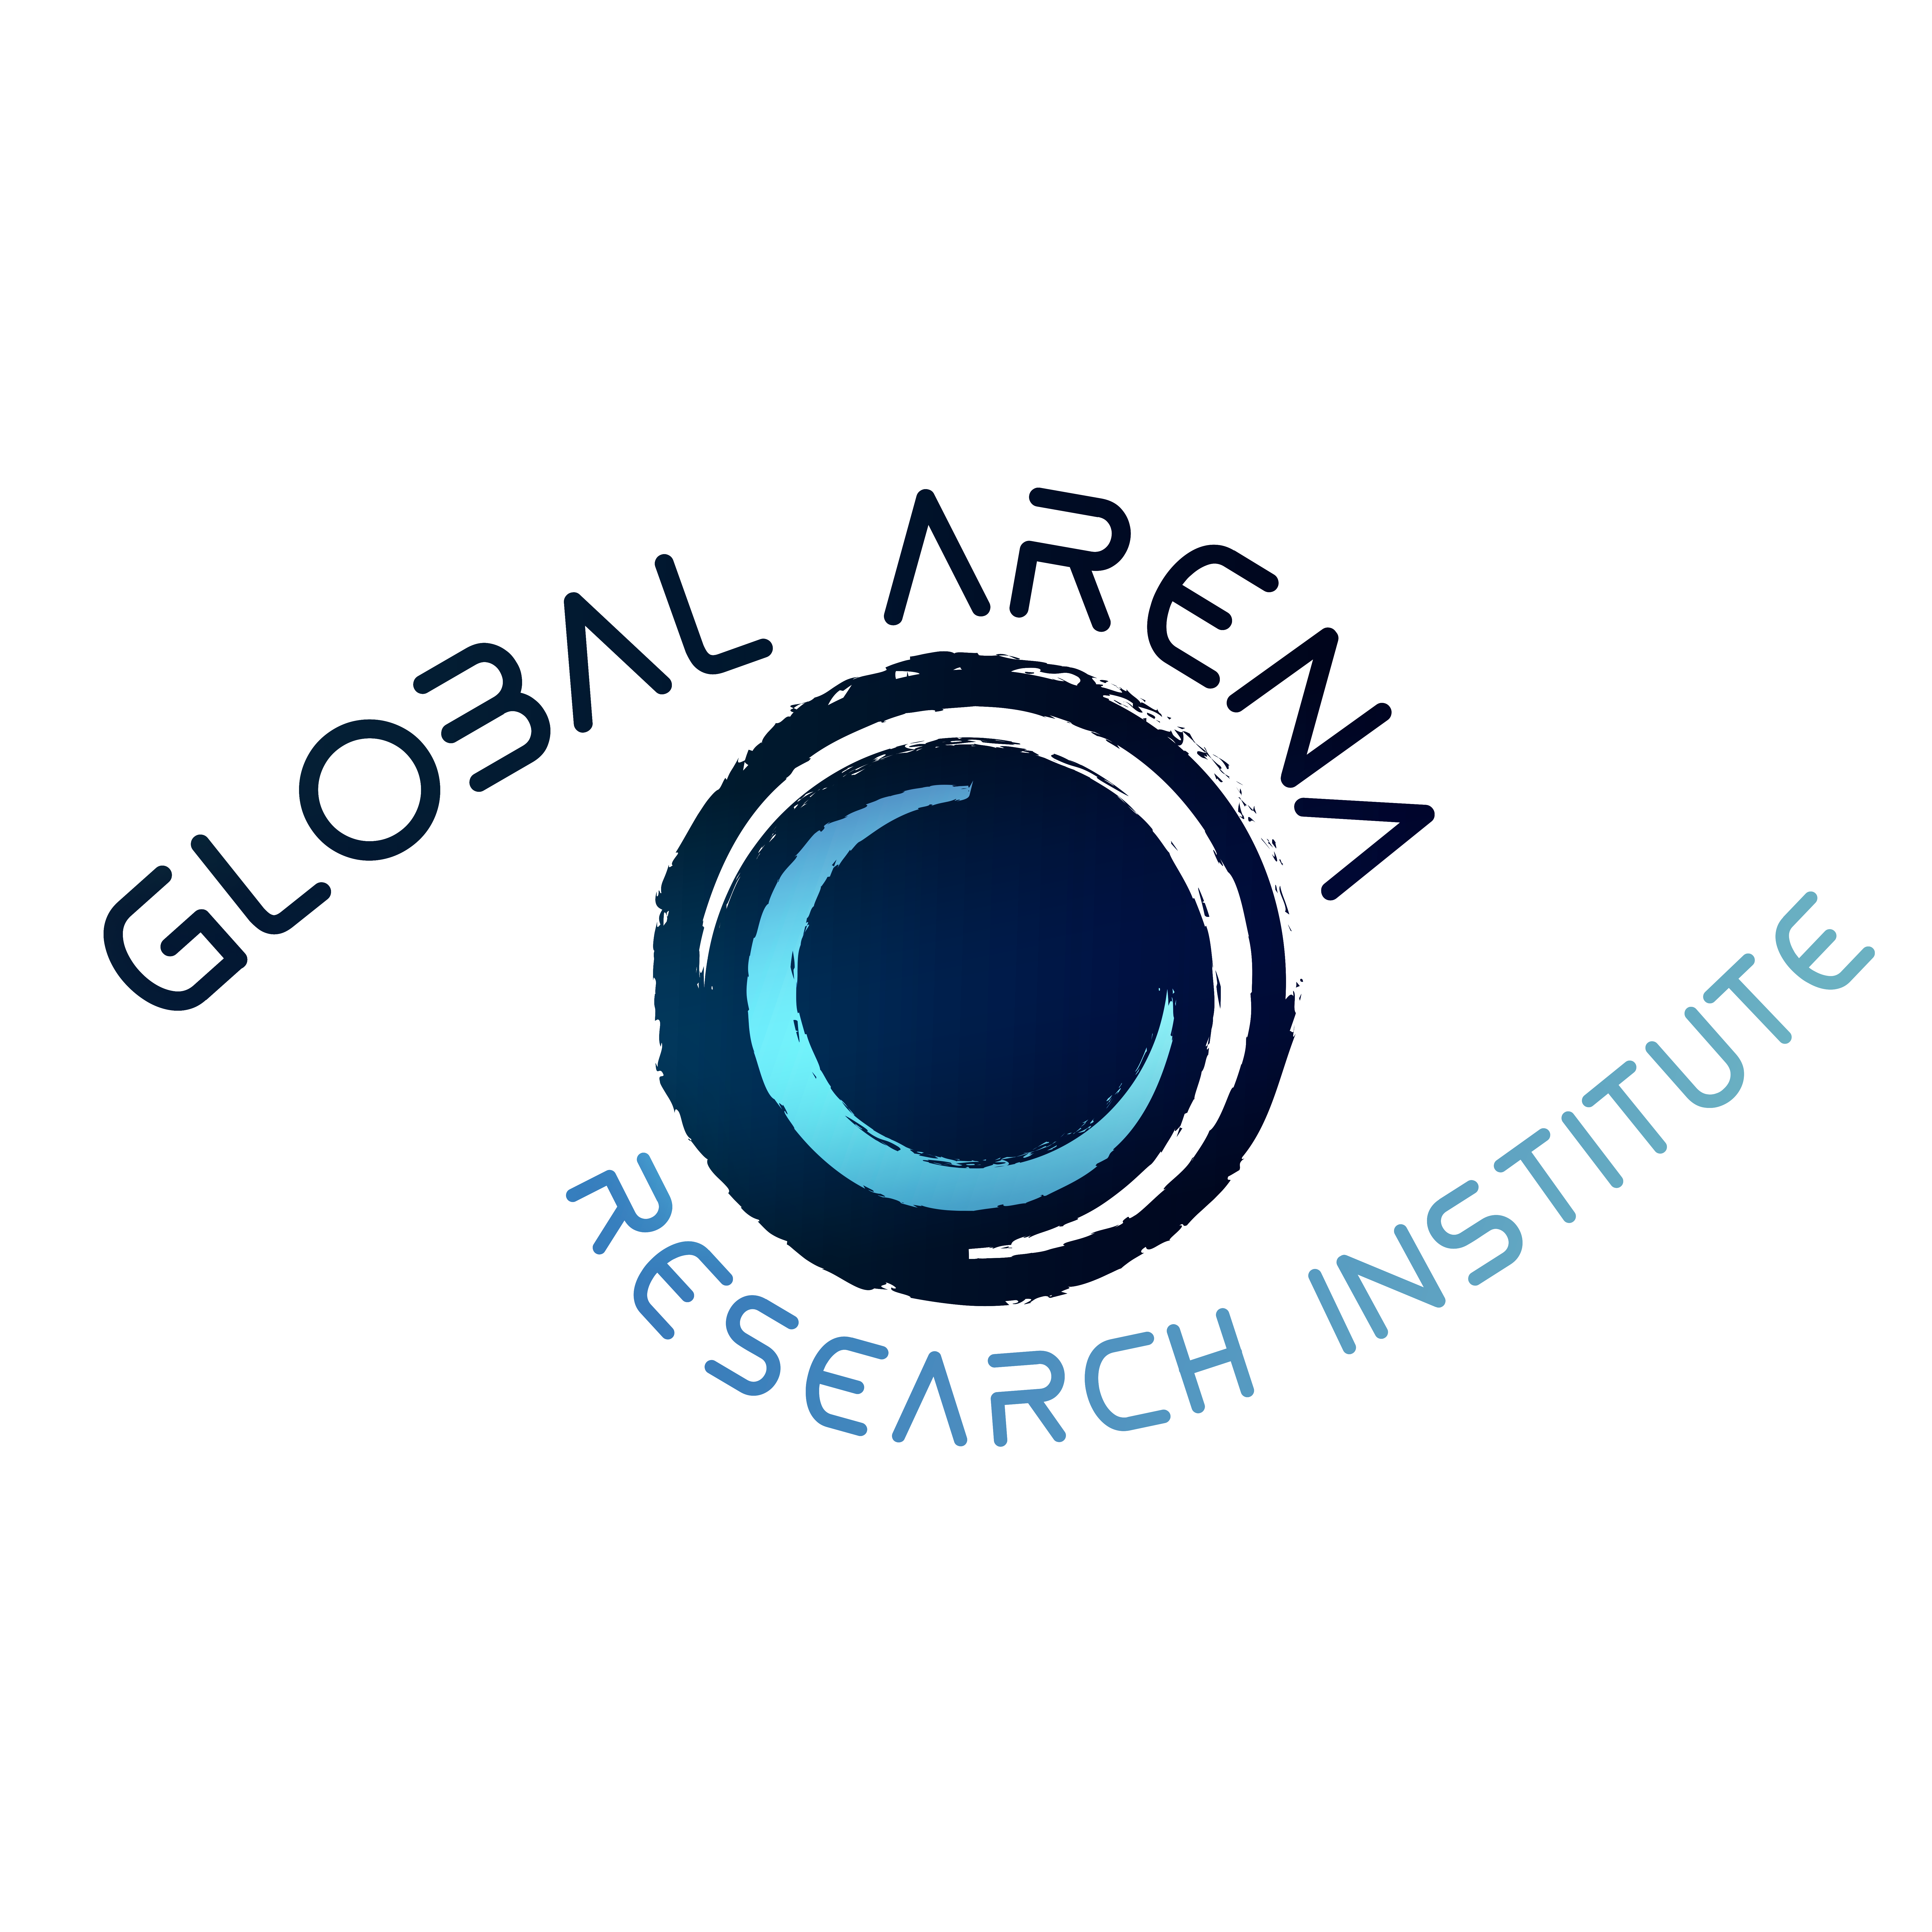 Global Arena Research Institute